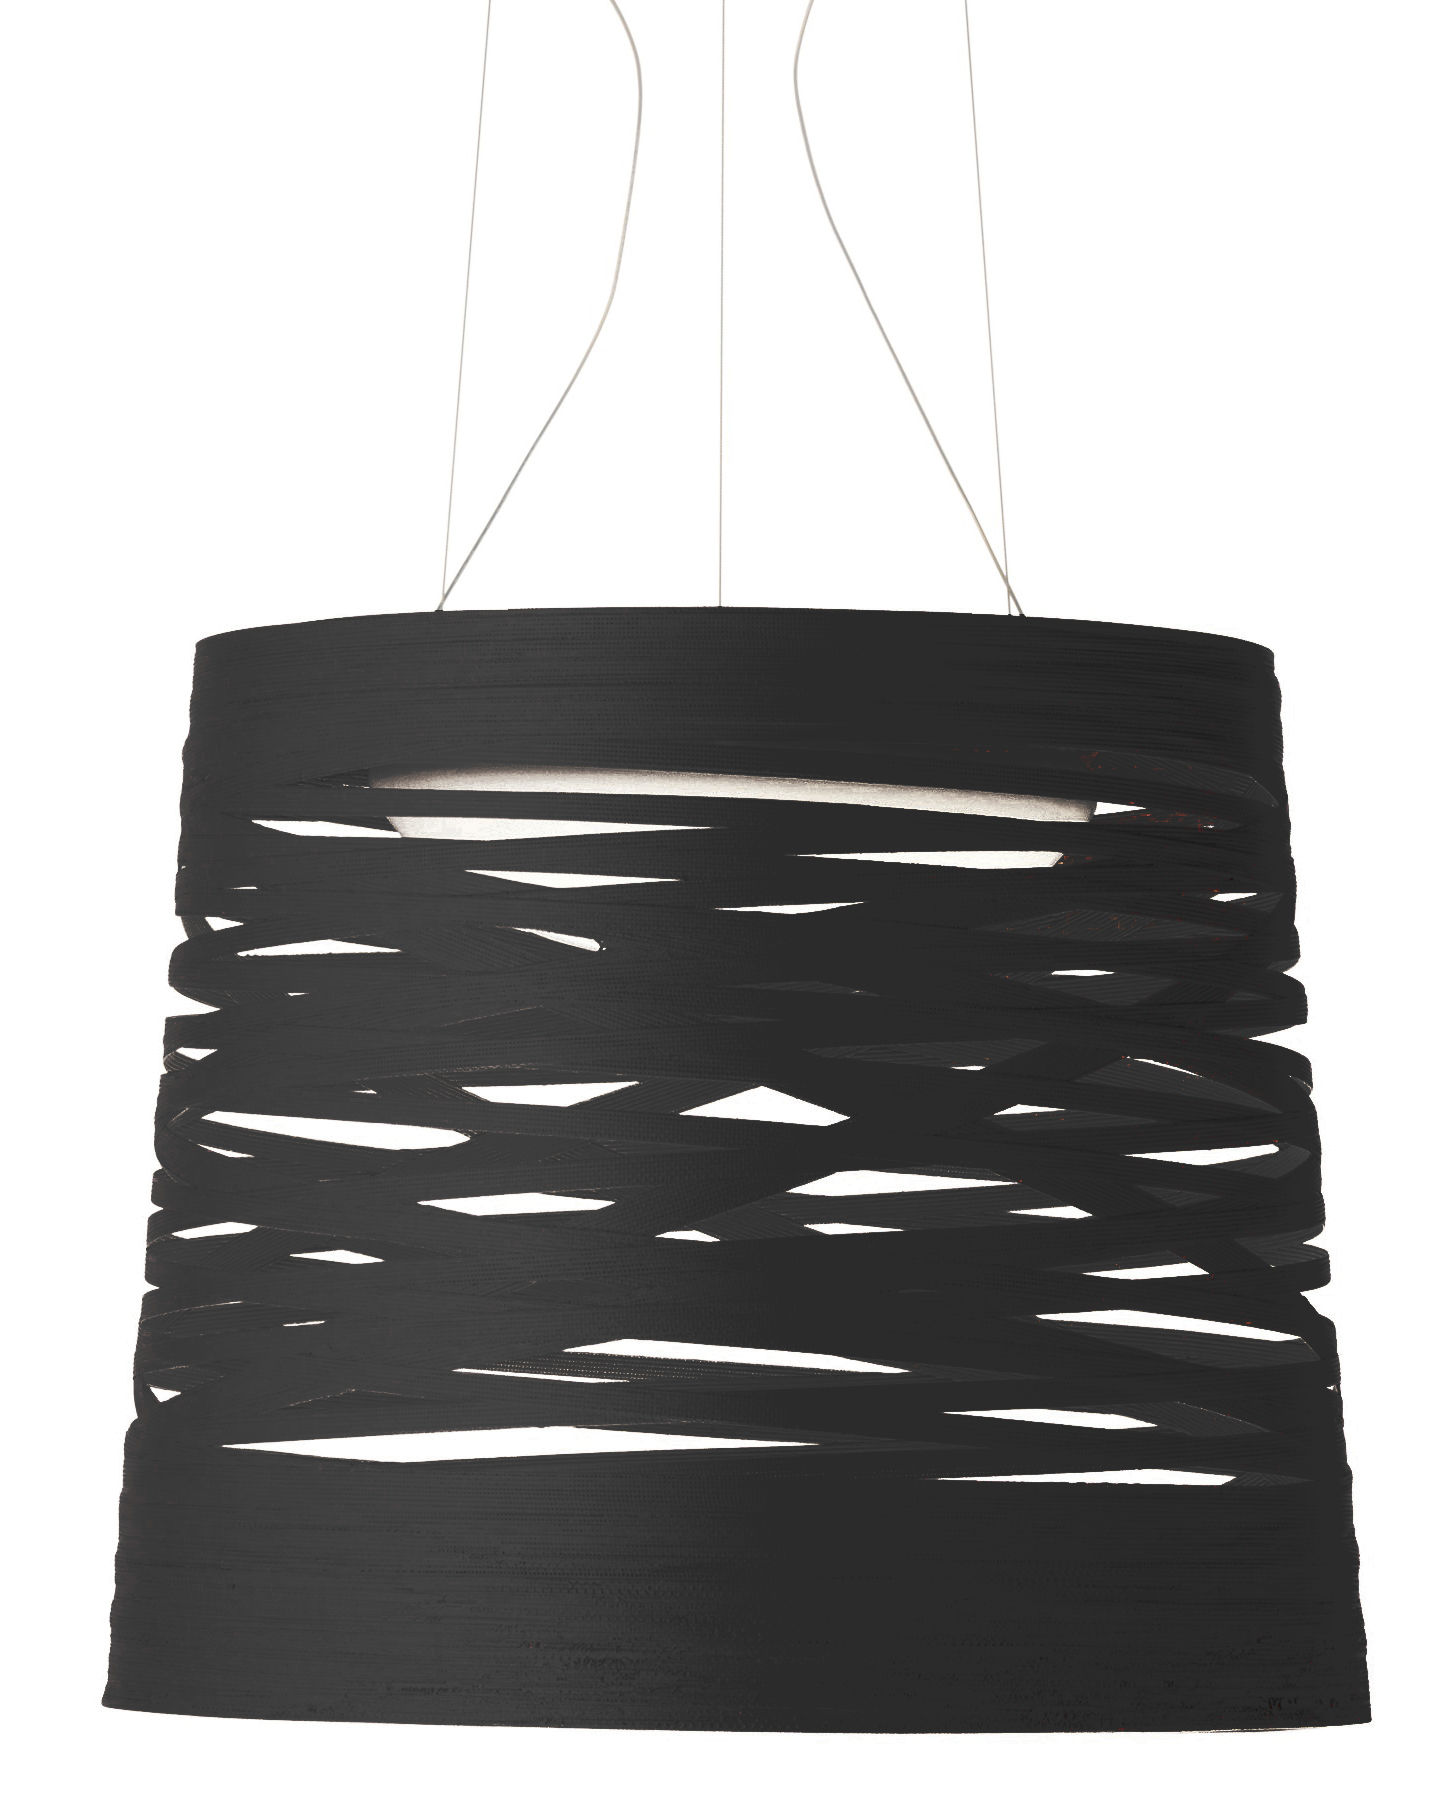 Lighting - Pendant Lighting - Tress Pendant by Foscarini - Black - Fibreglass, Lacquered composite material, Opal Glass, Steel